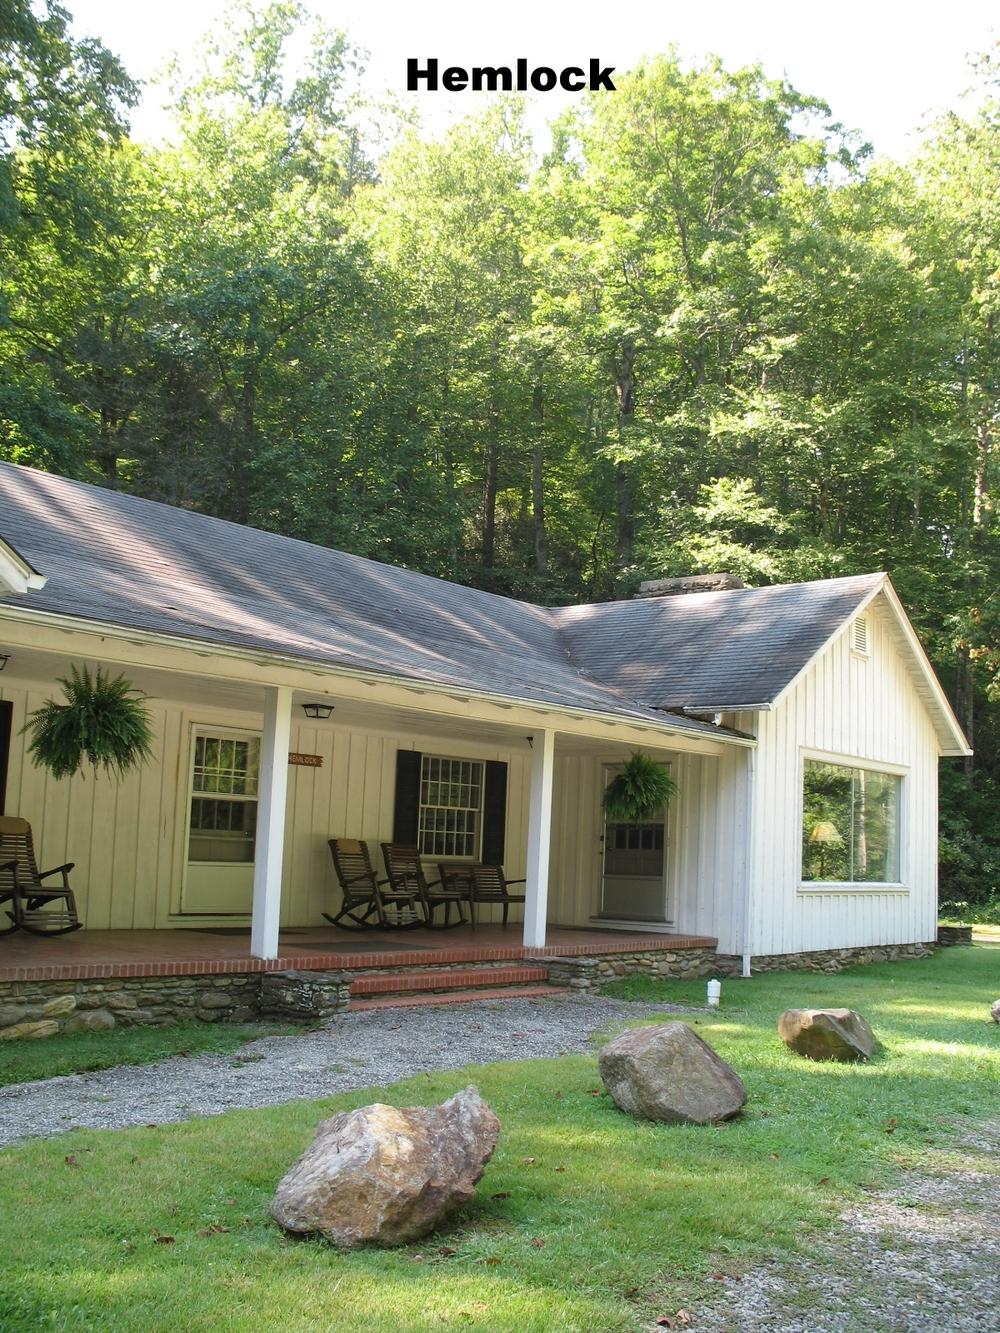 Hemlock Cabin.JPG